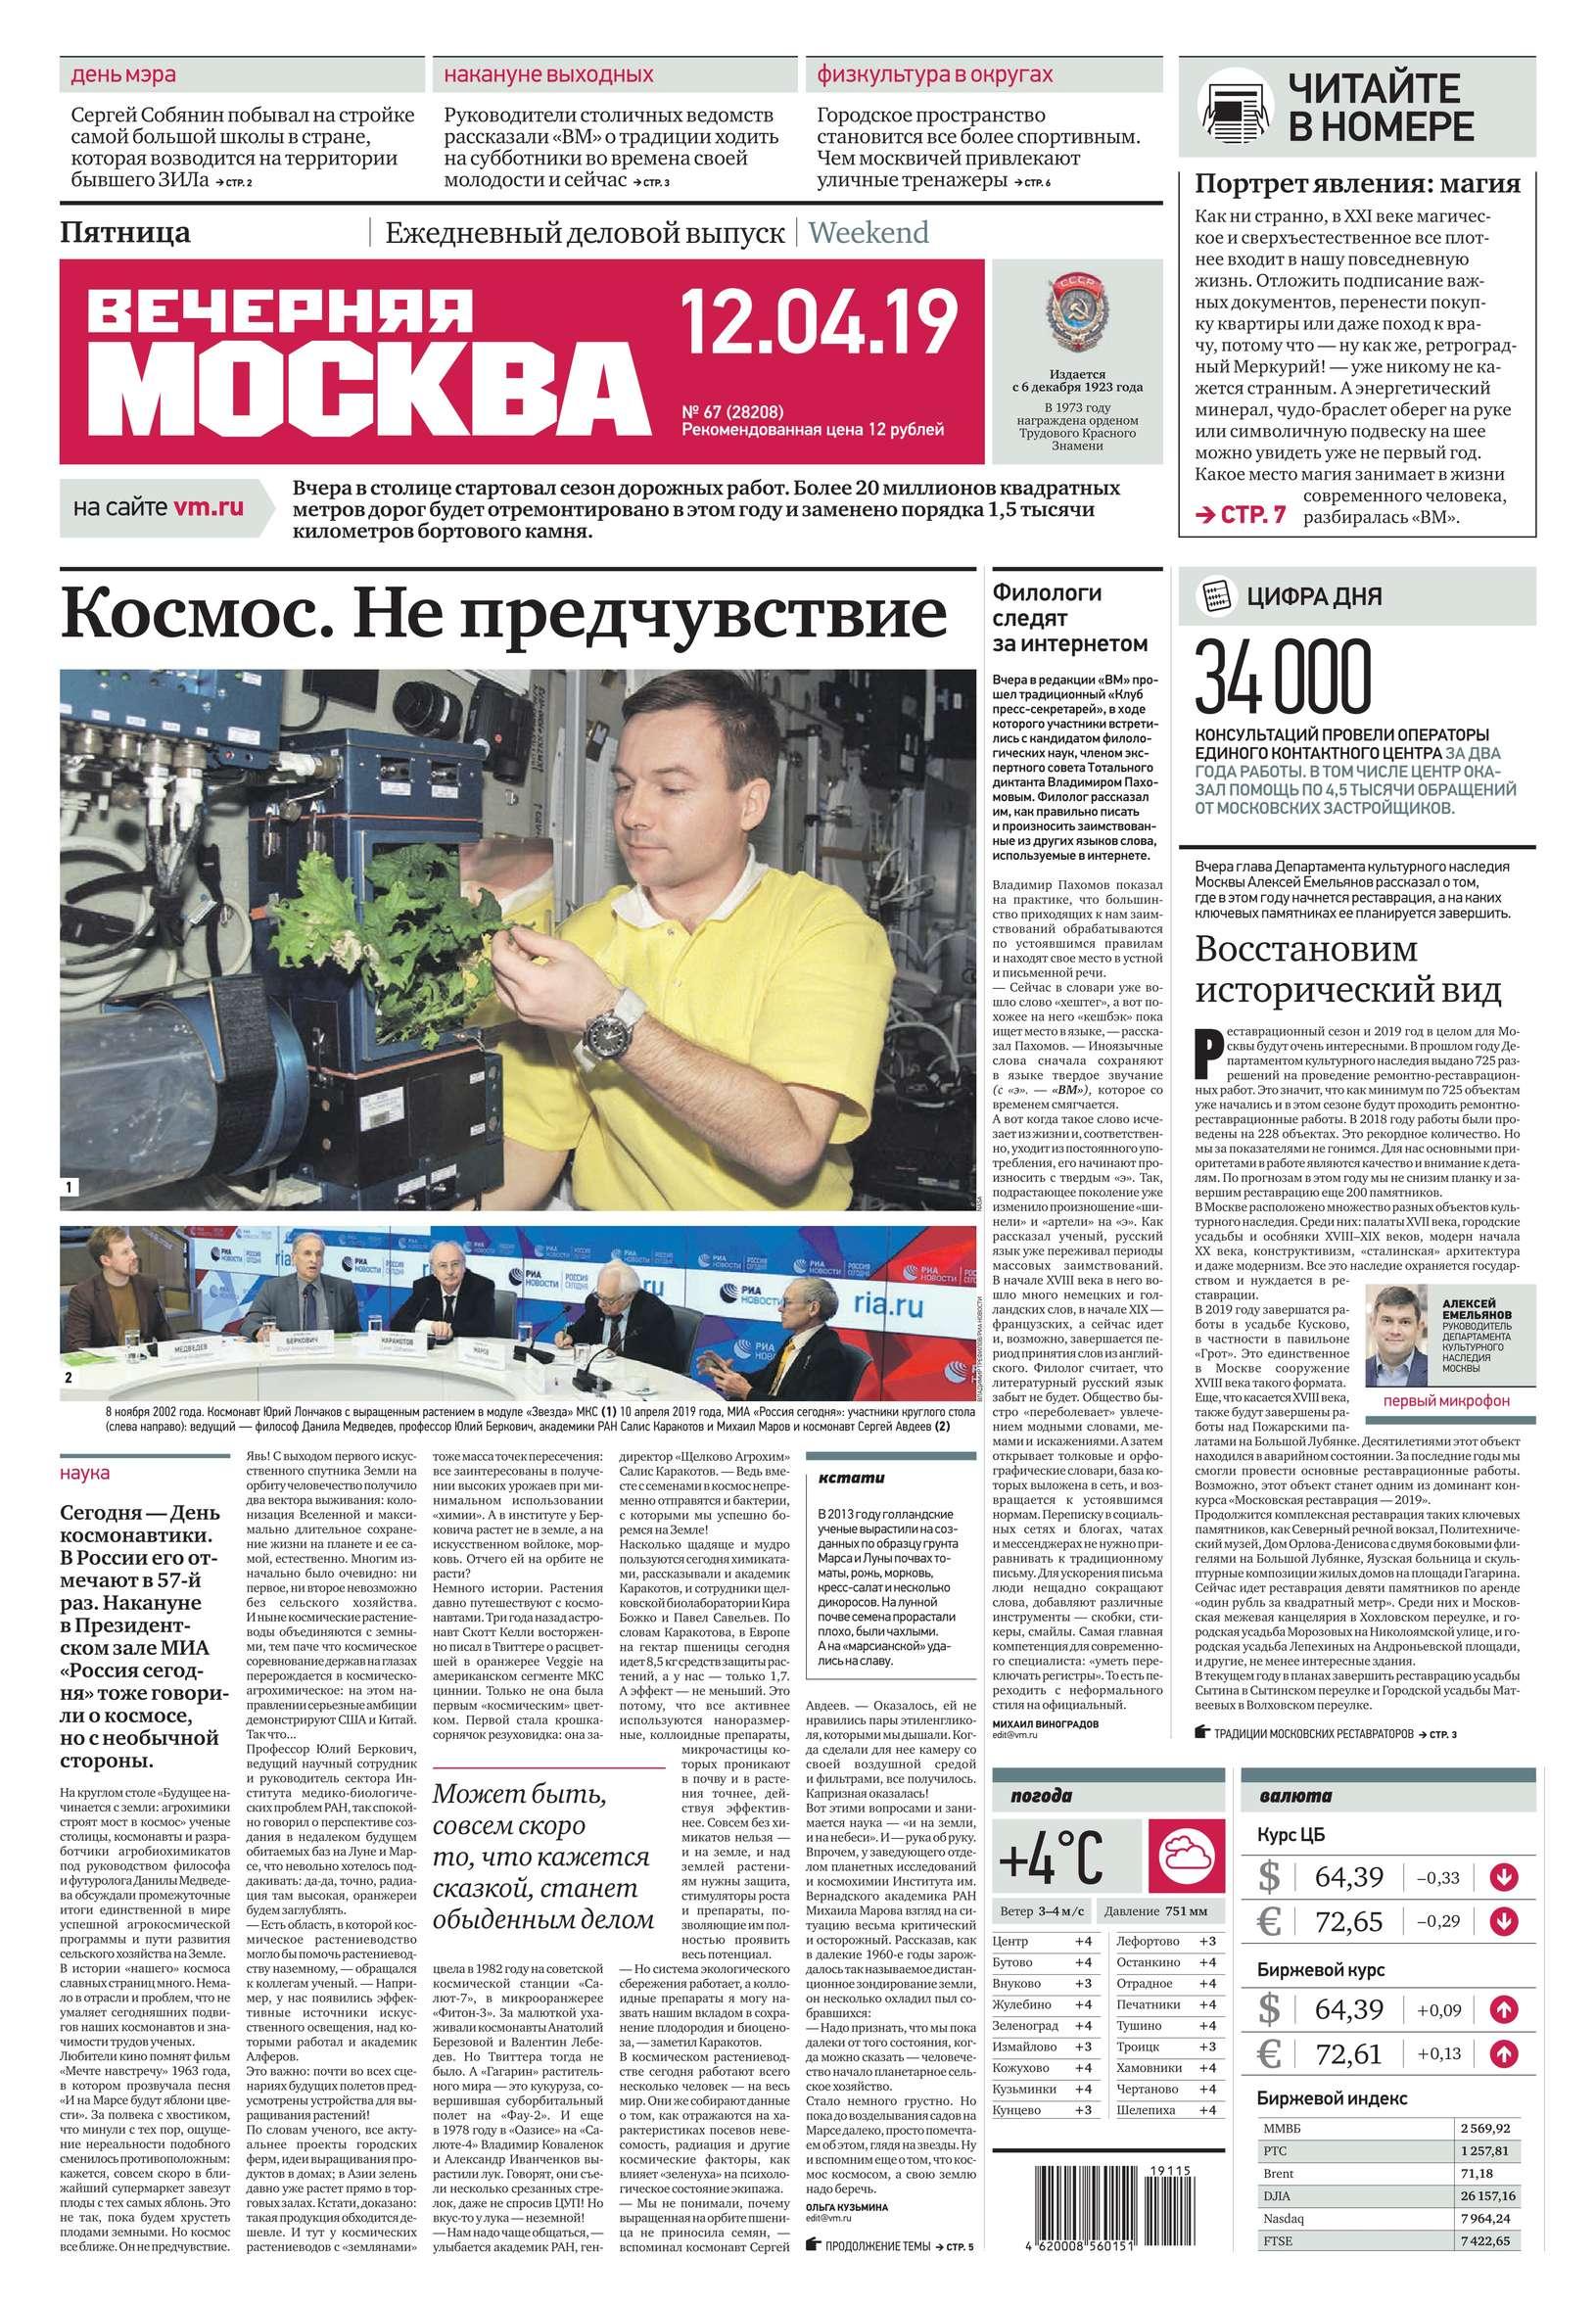 Редакция газеты Вечерняя Москва Вечерняя Москва 67-2019 вечерняя москва 2019 08 06t20 30